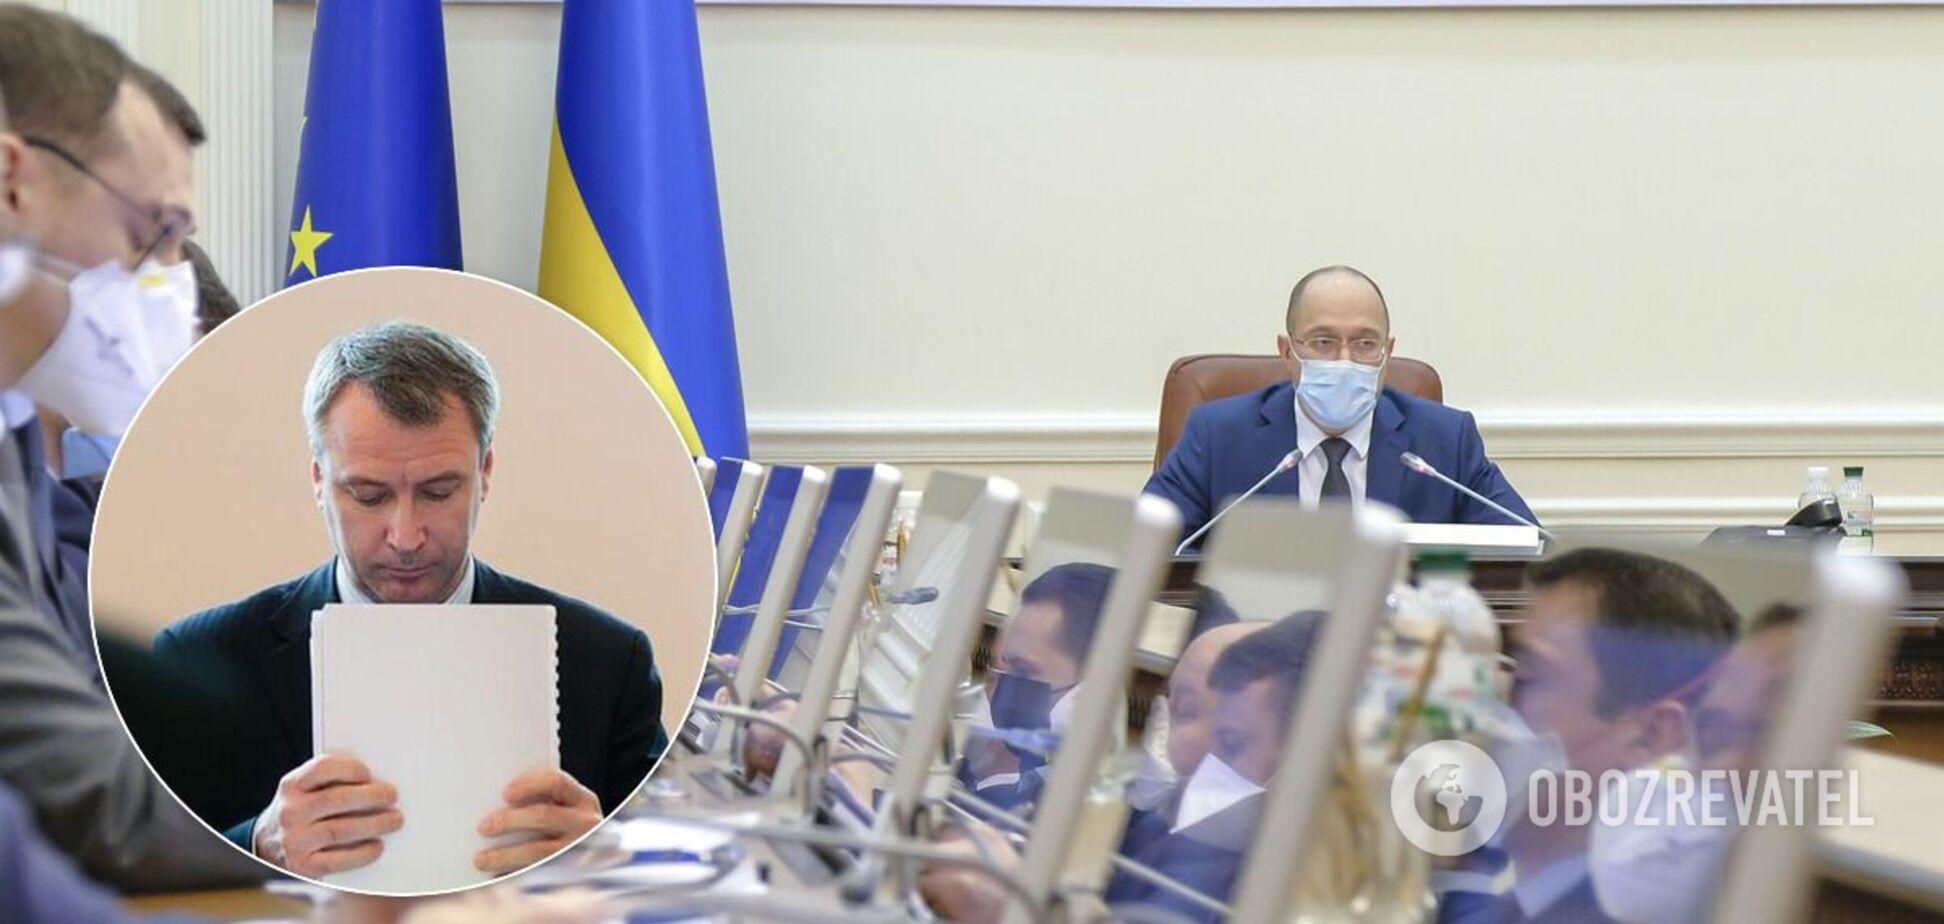 Кабмин уволил Немилостивого после публикации OBOZREVATEL